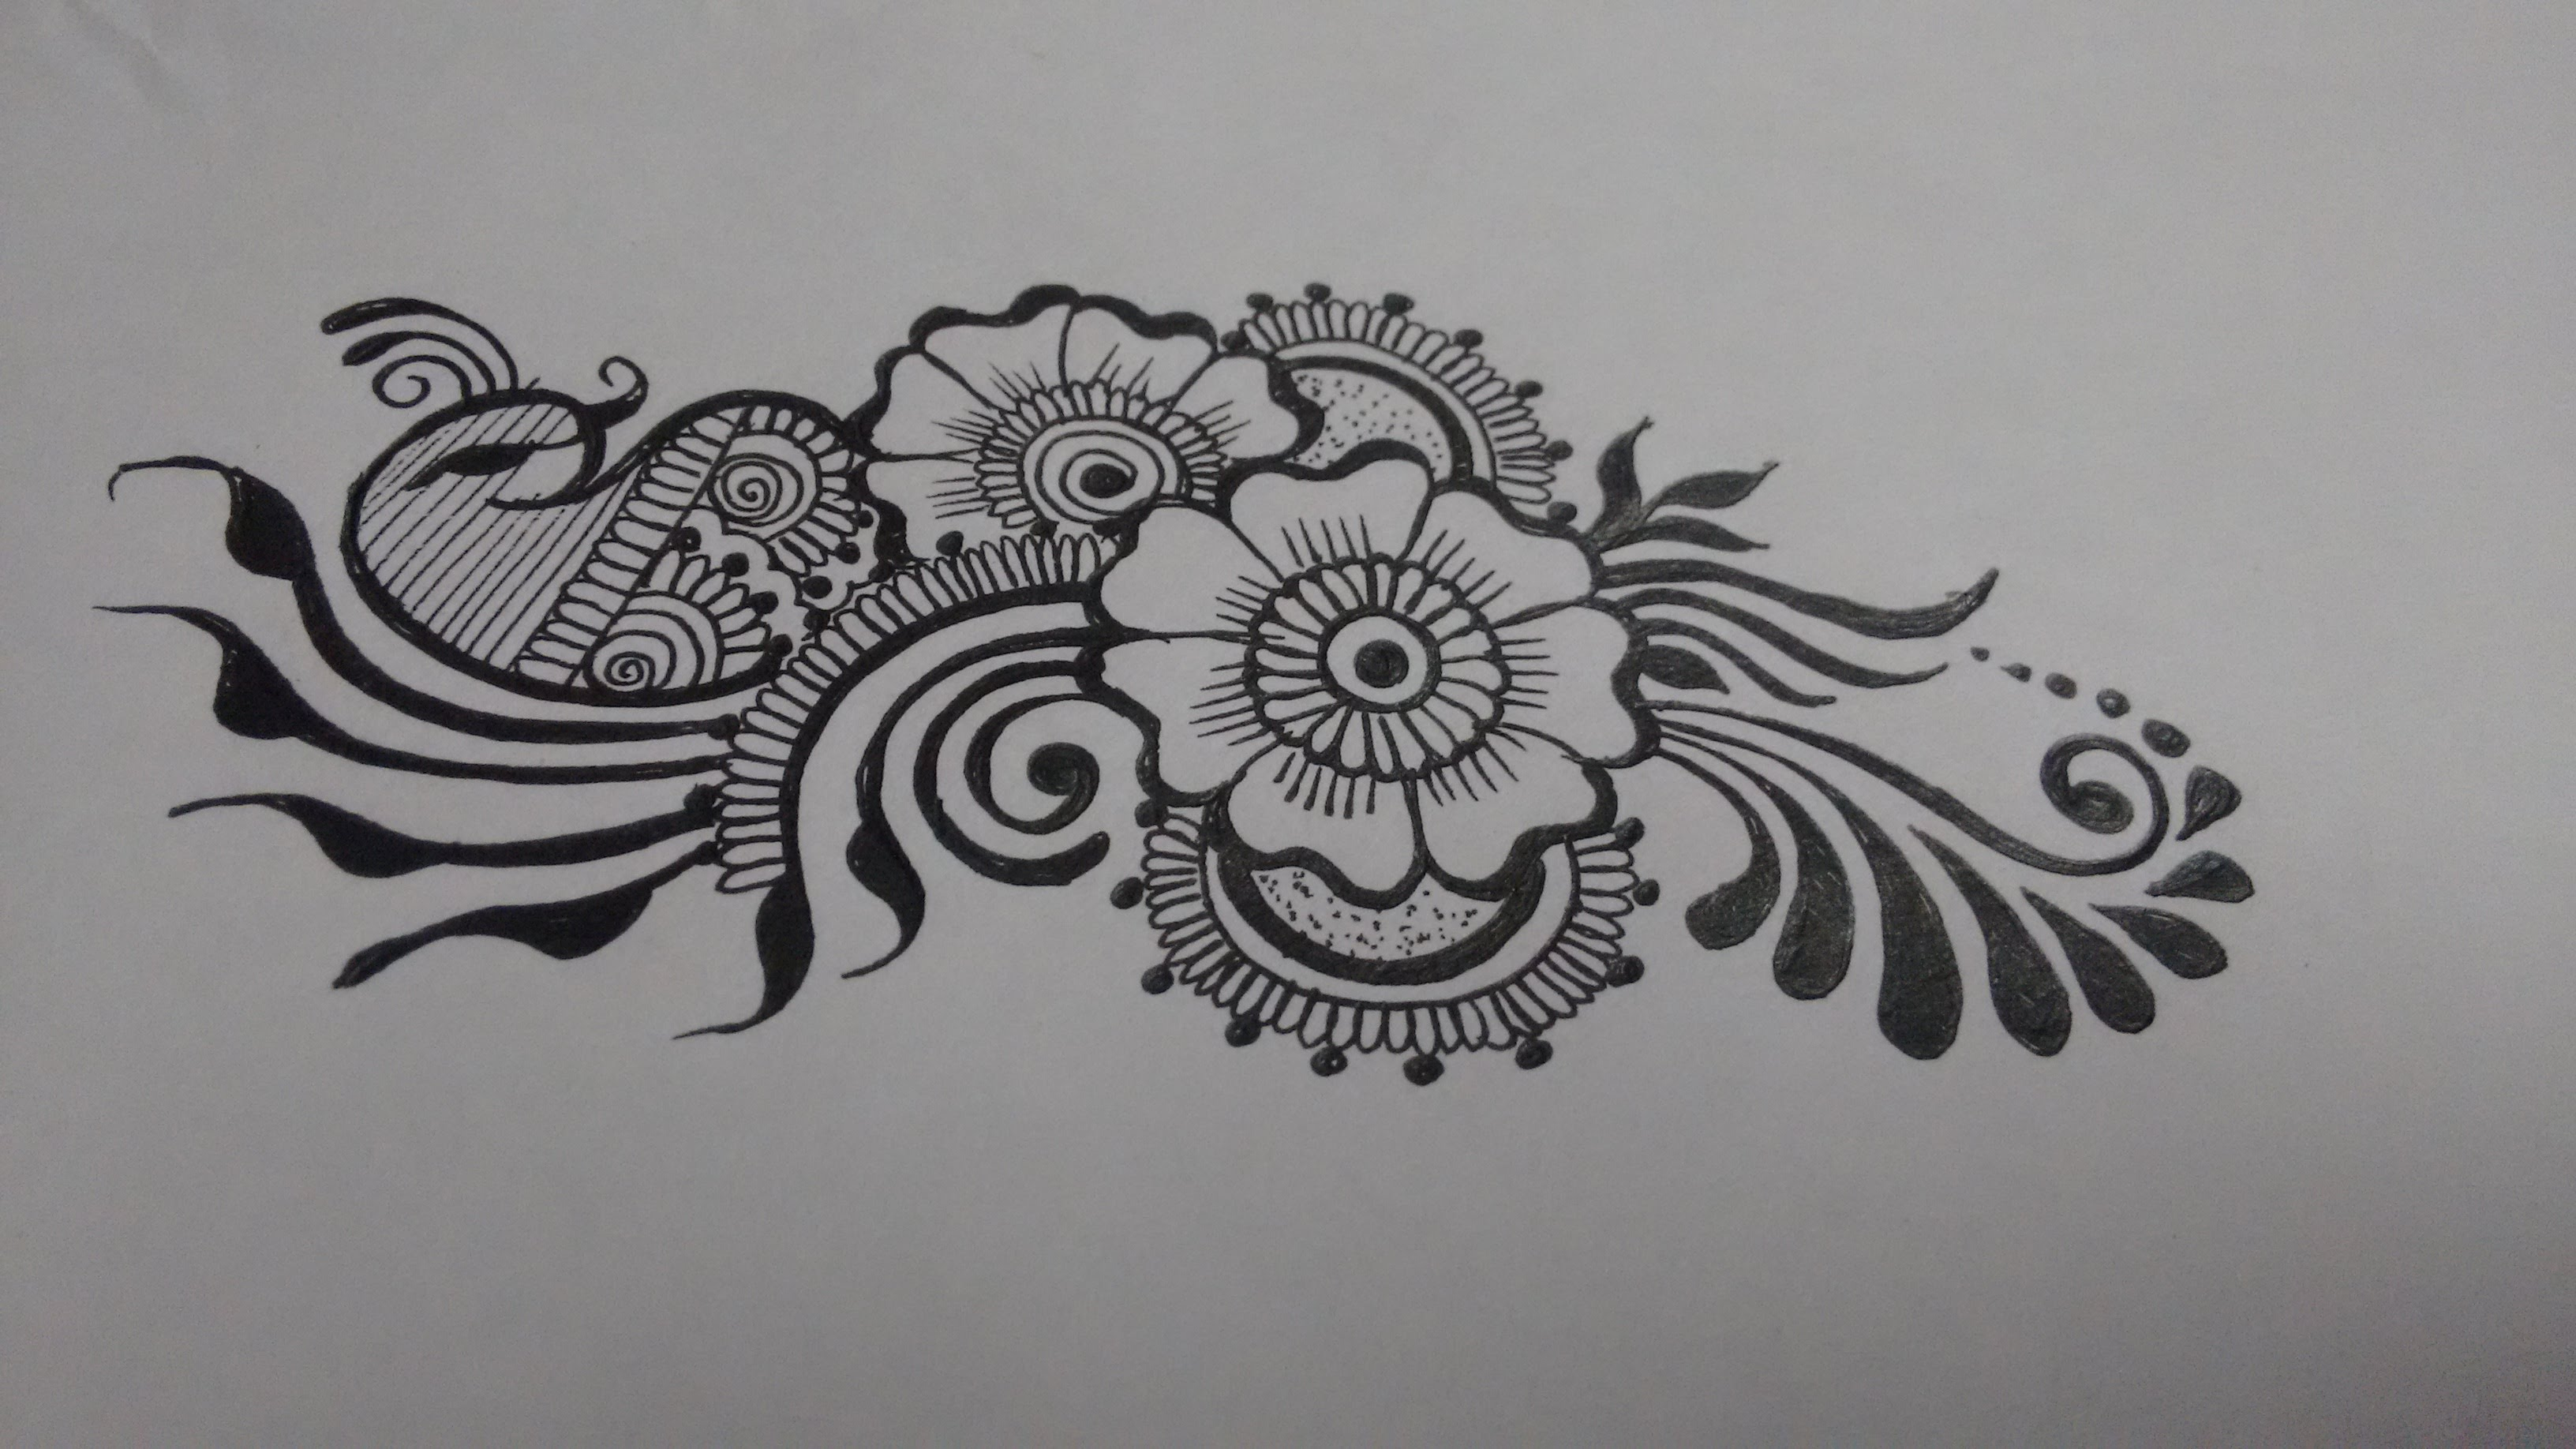 Drawn paper henna design Henna Mehndi to Matroj designs